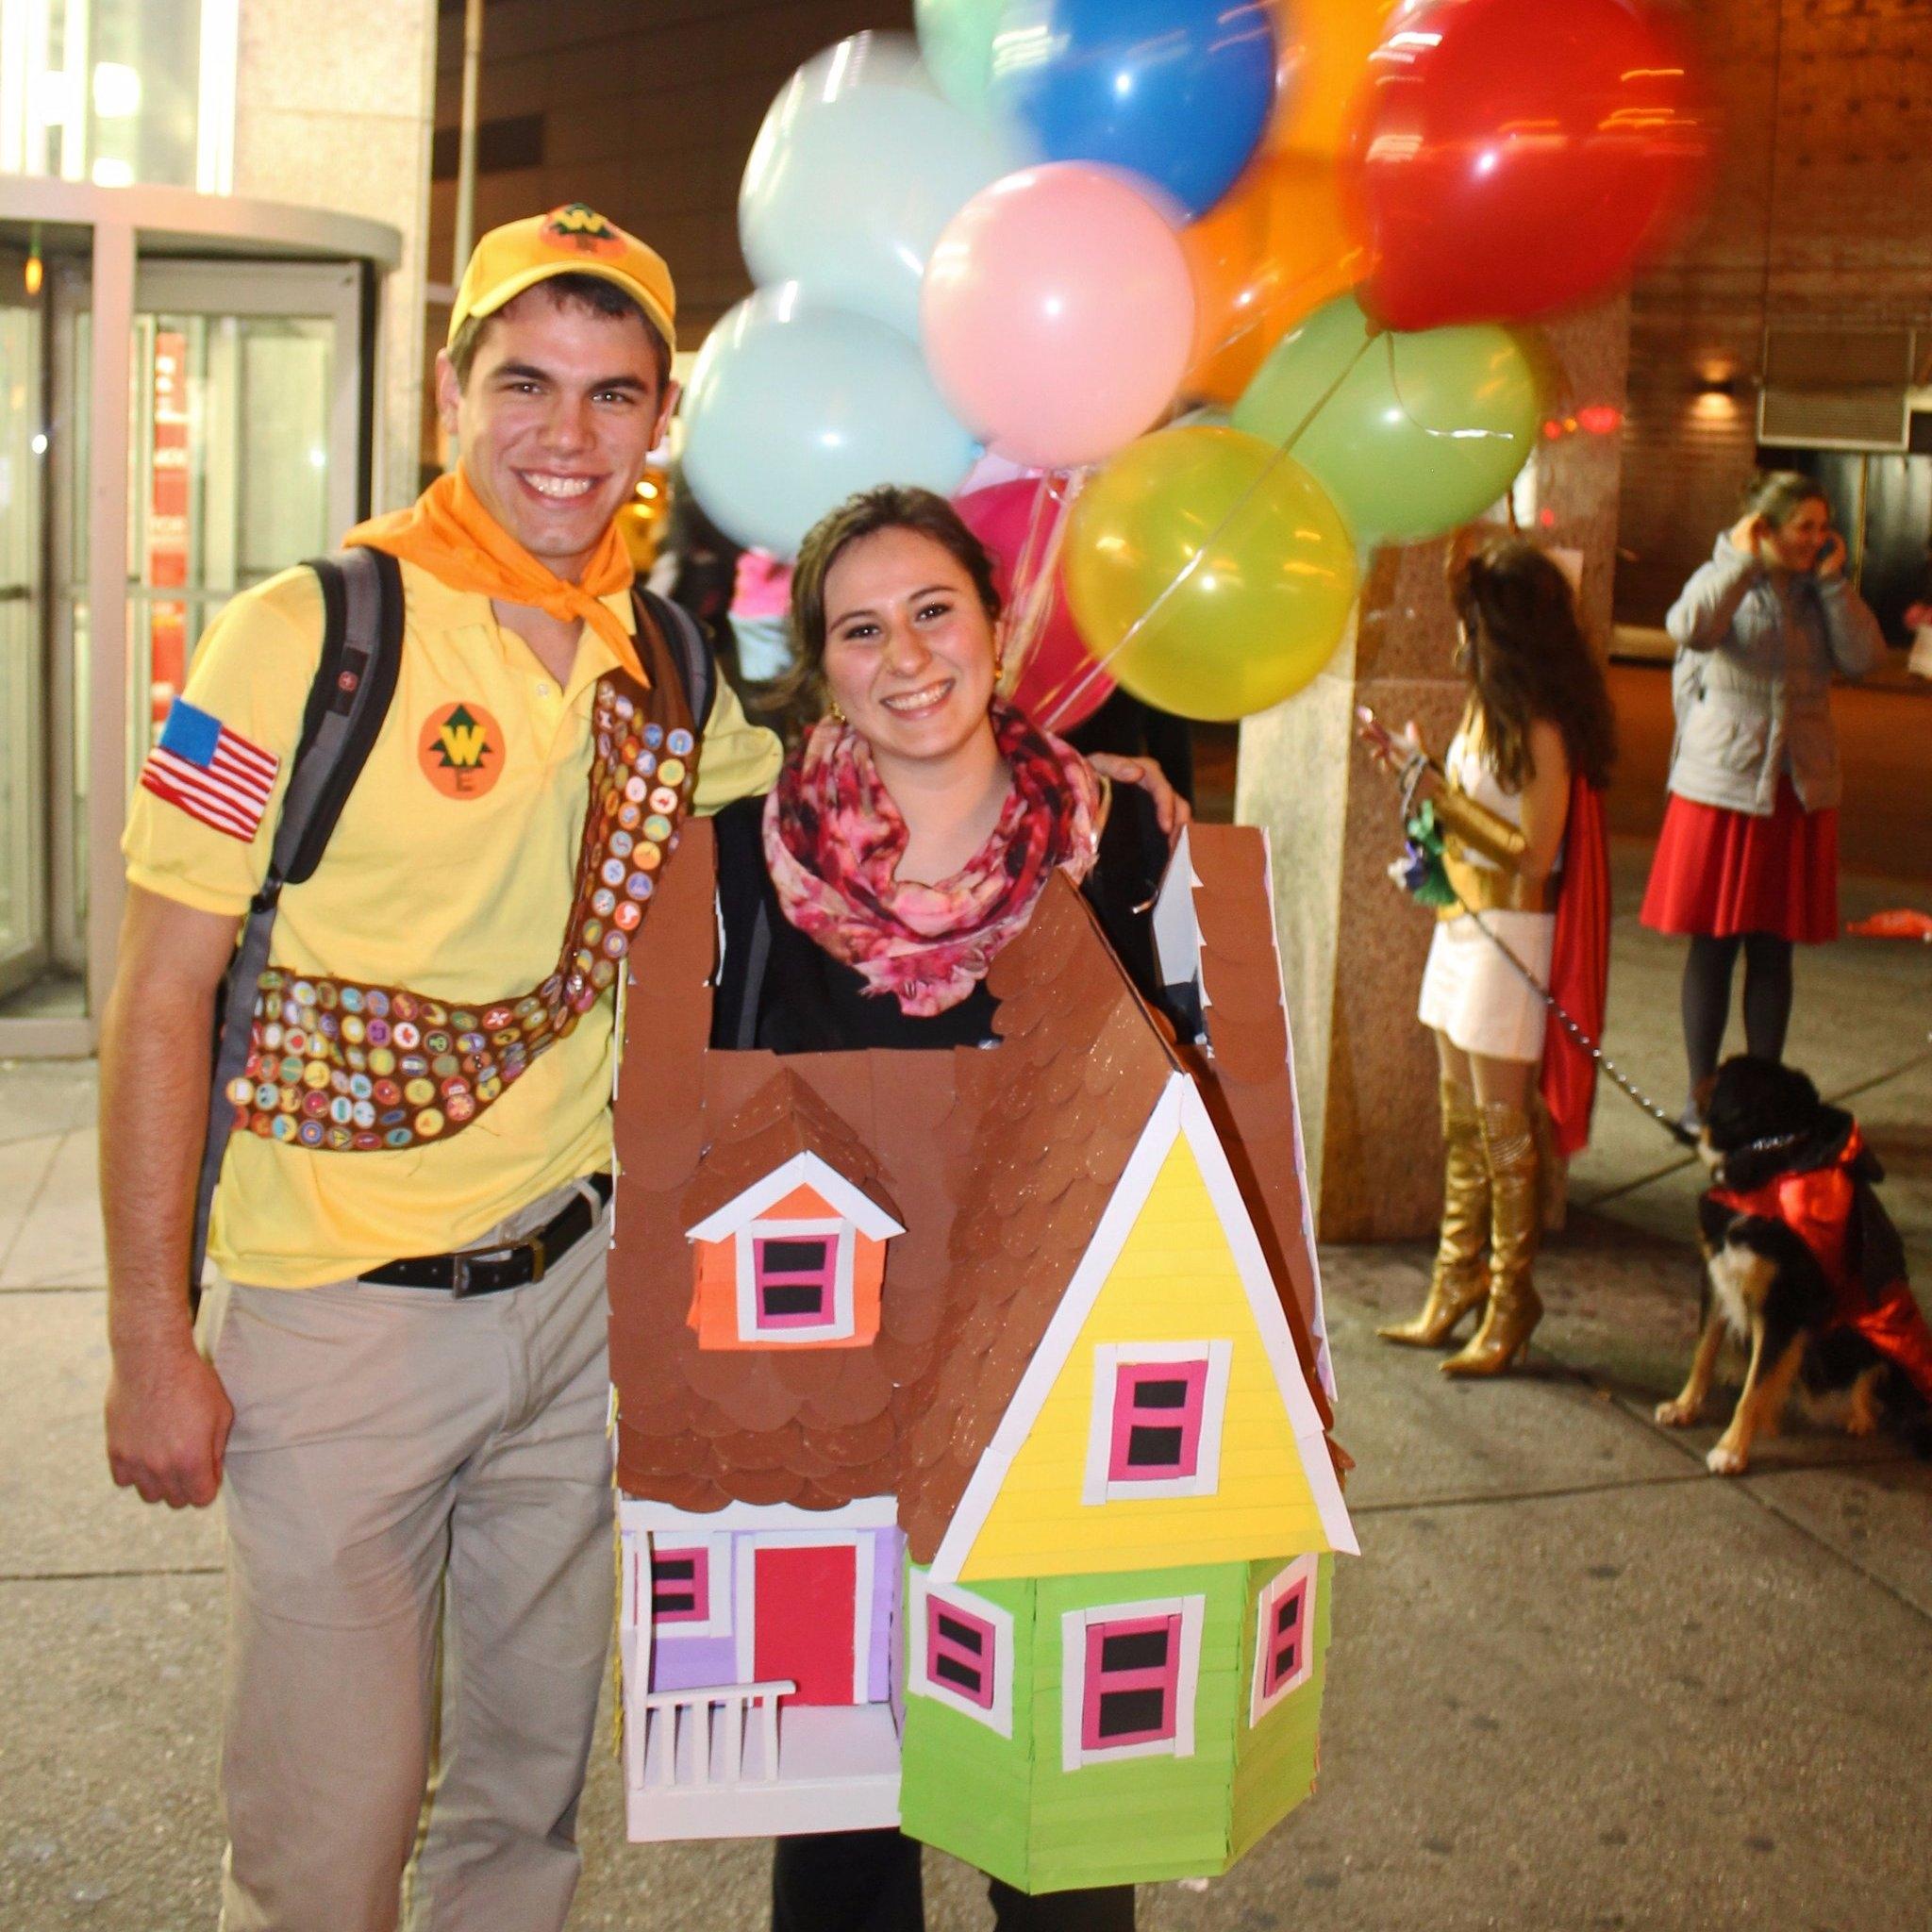 10 Unique Easy Couple Halloween Costume Ideas cheap diy couples halloween costumes popsugar smart living 10 2021